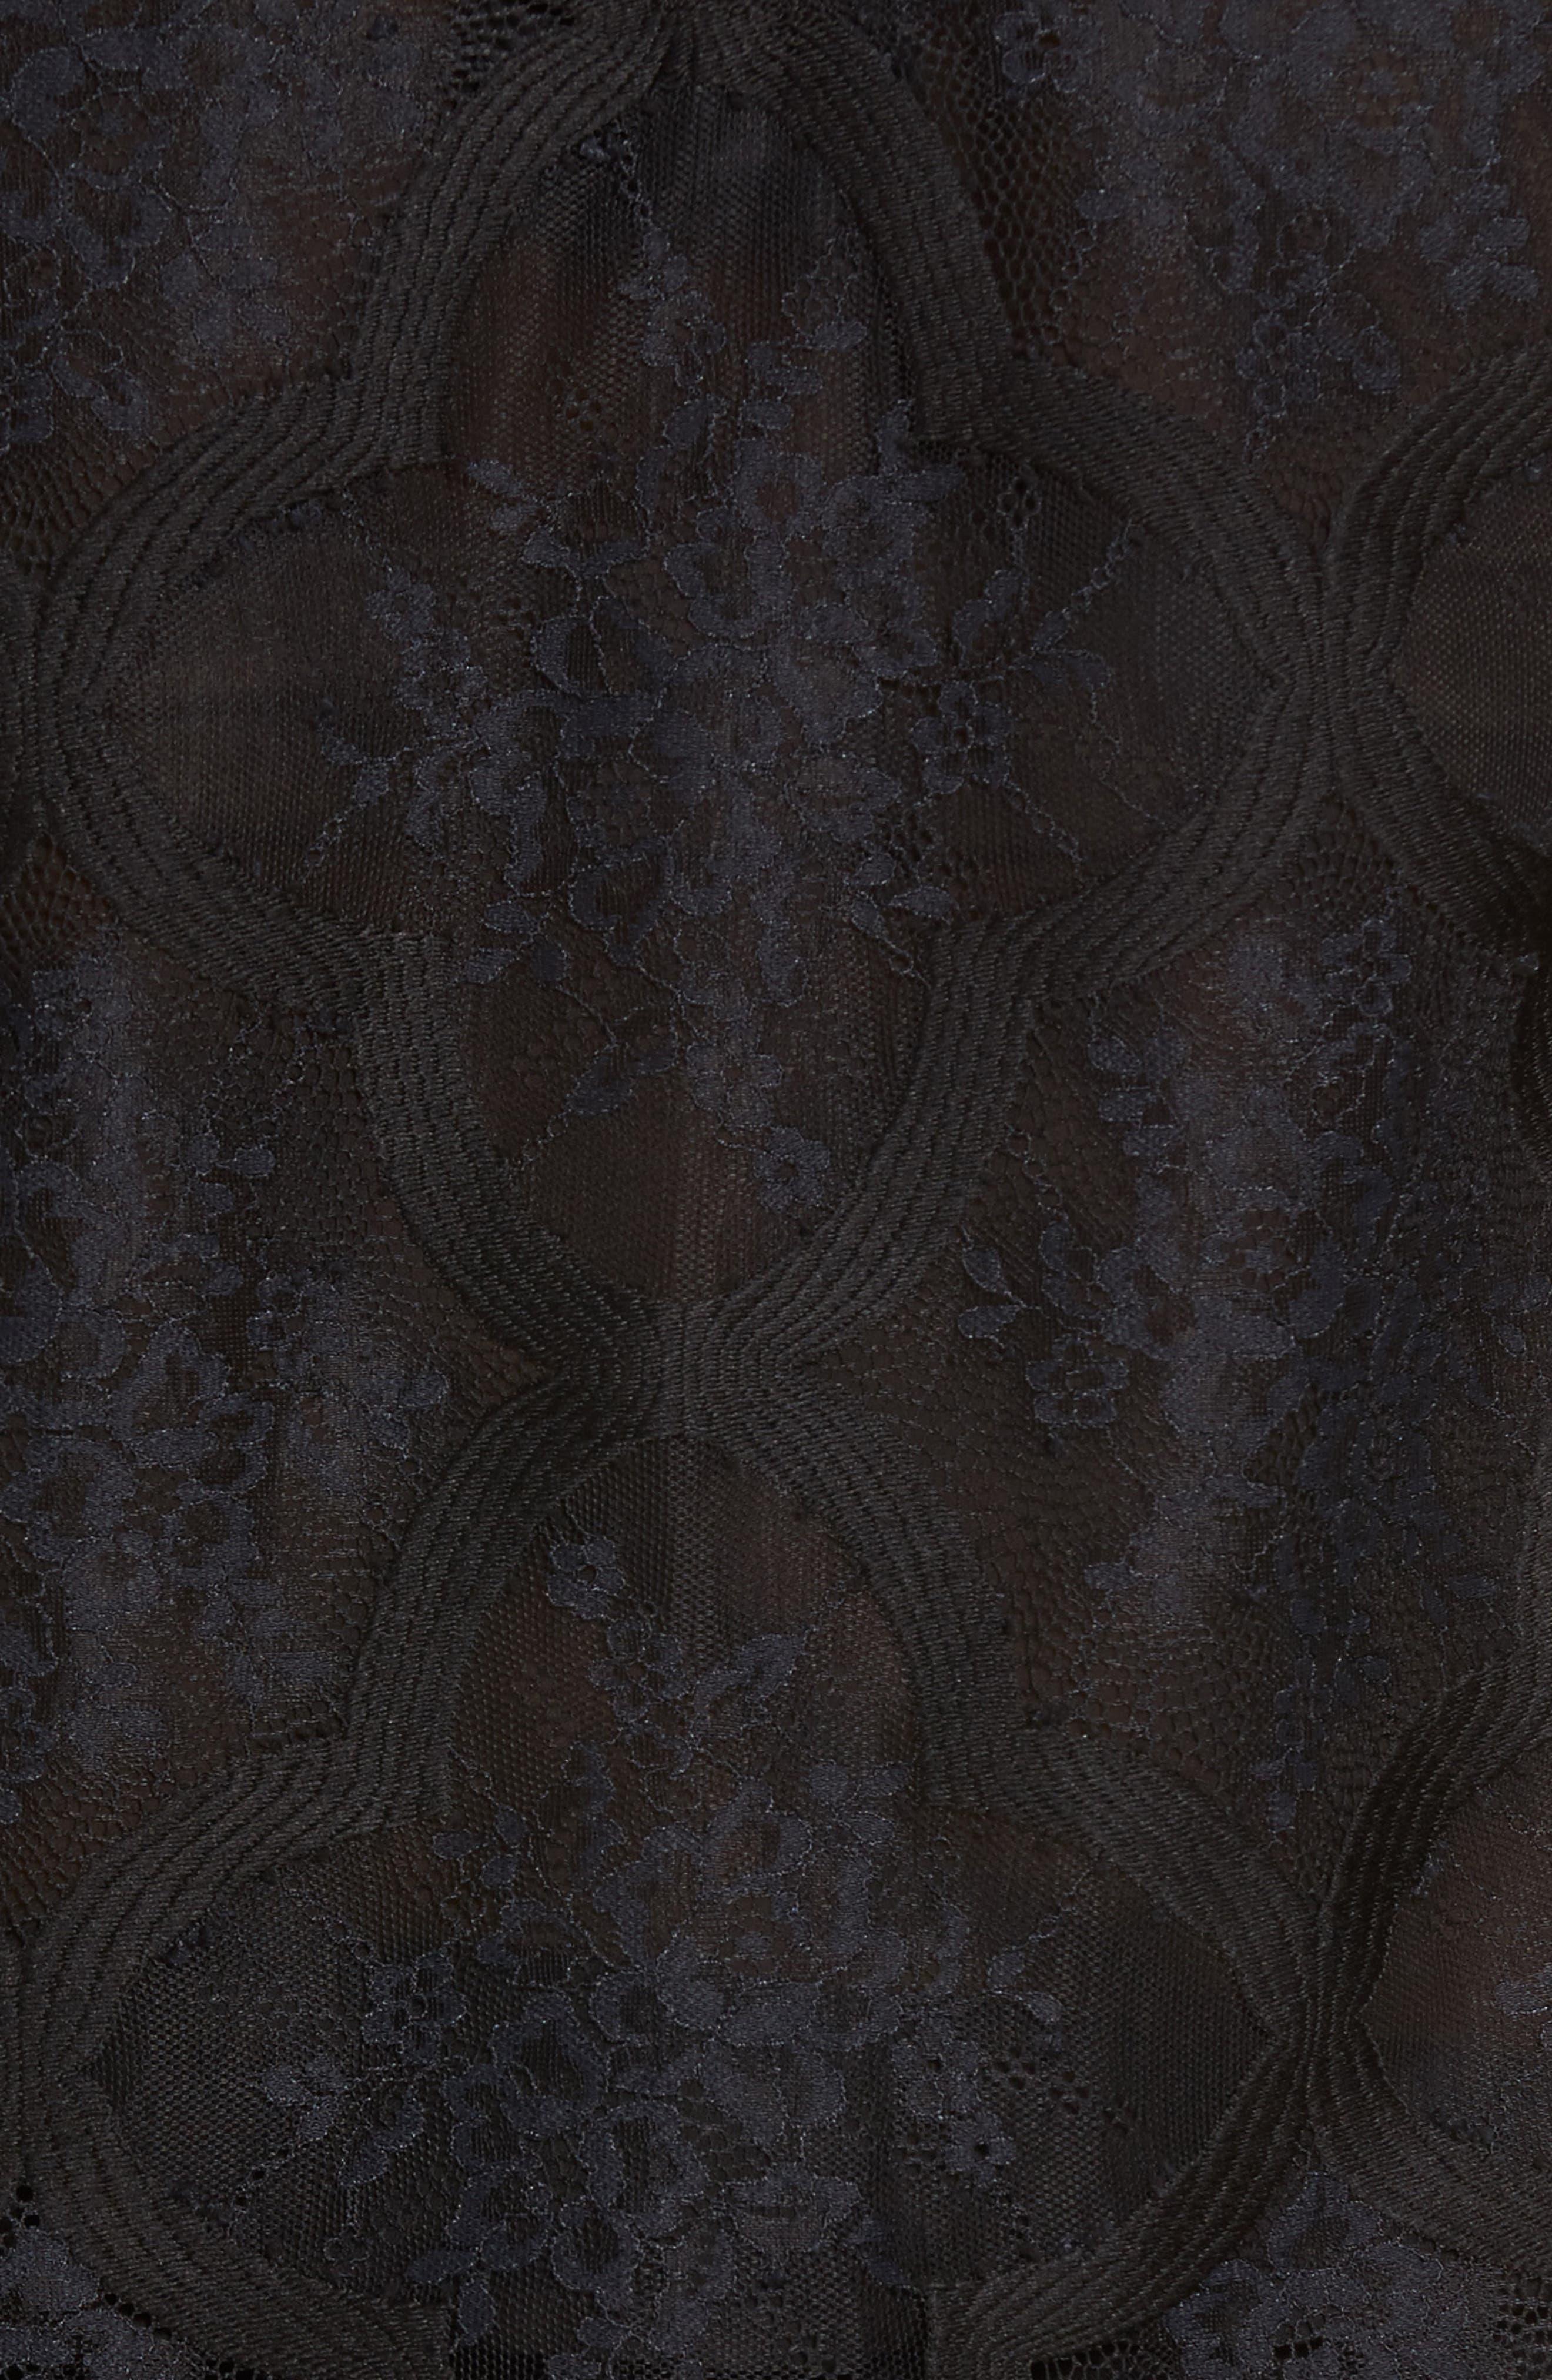 KENDALL + KYLIE,                             Lace Crop Top,                             Alternate thumbnail 5, color,                             001